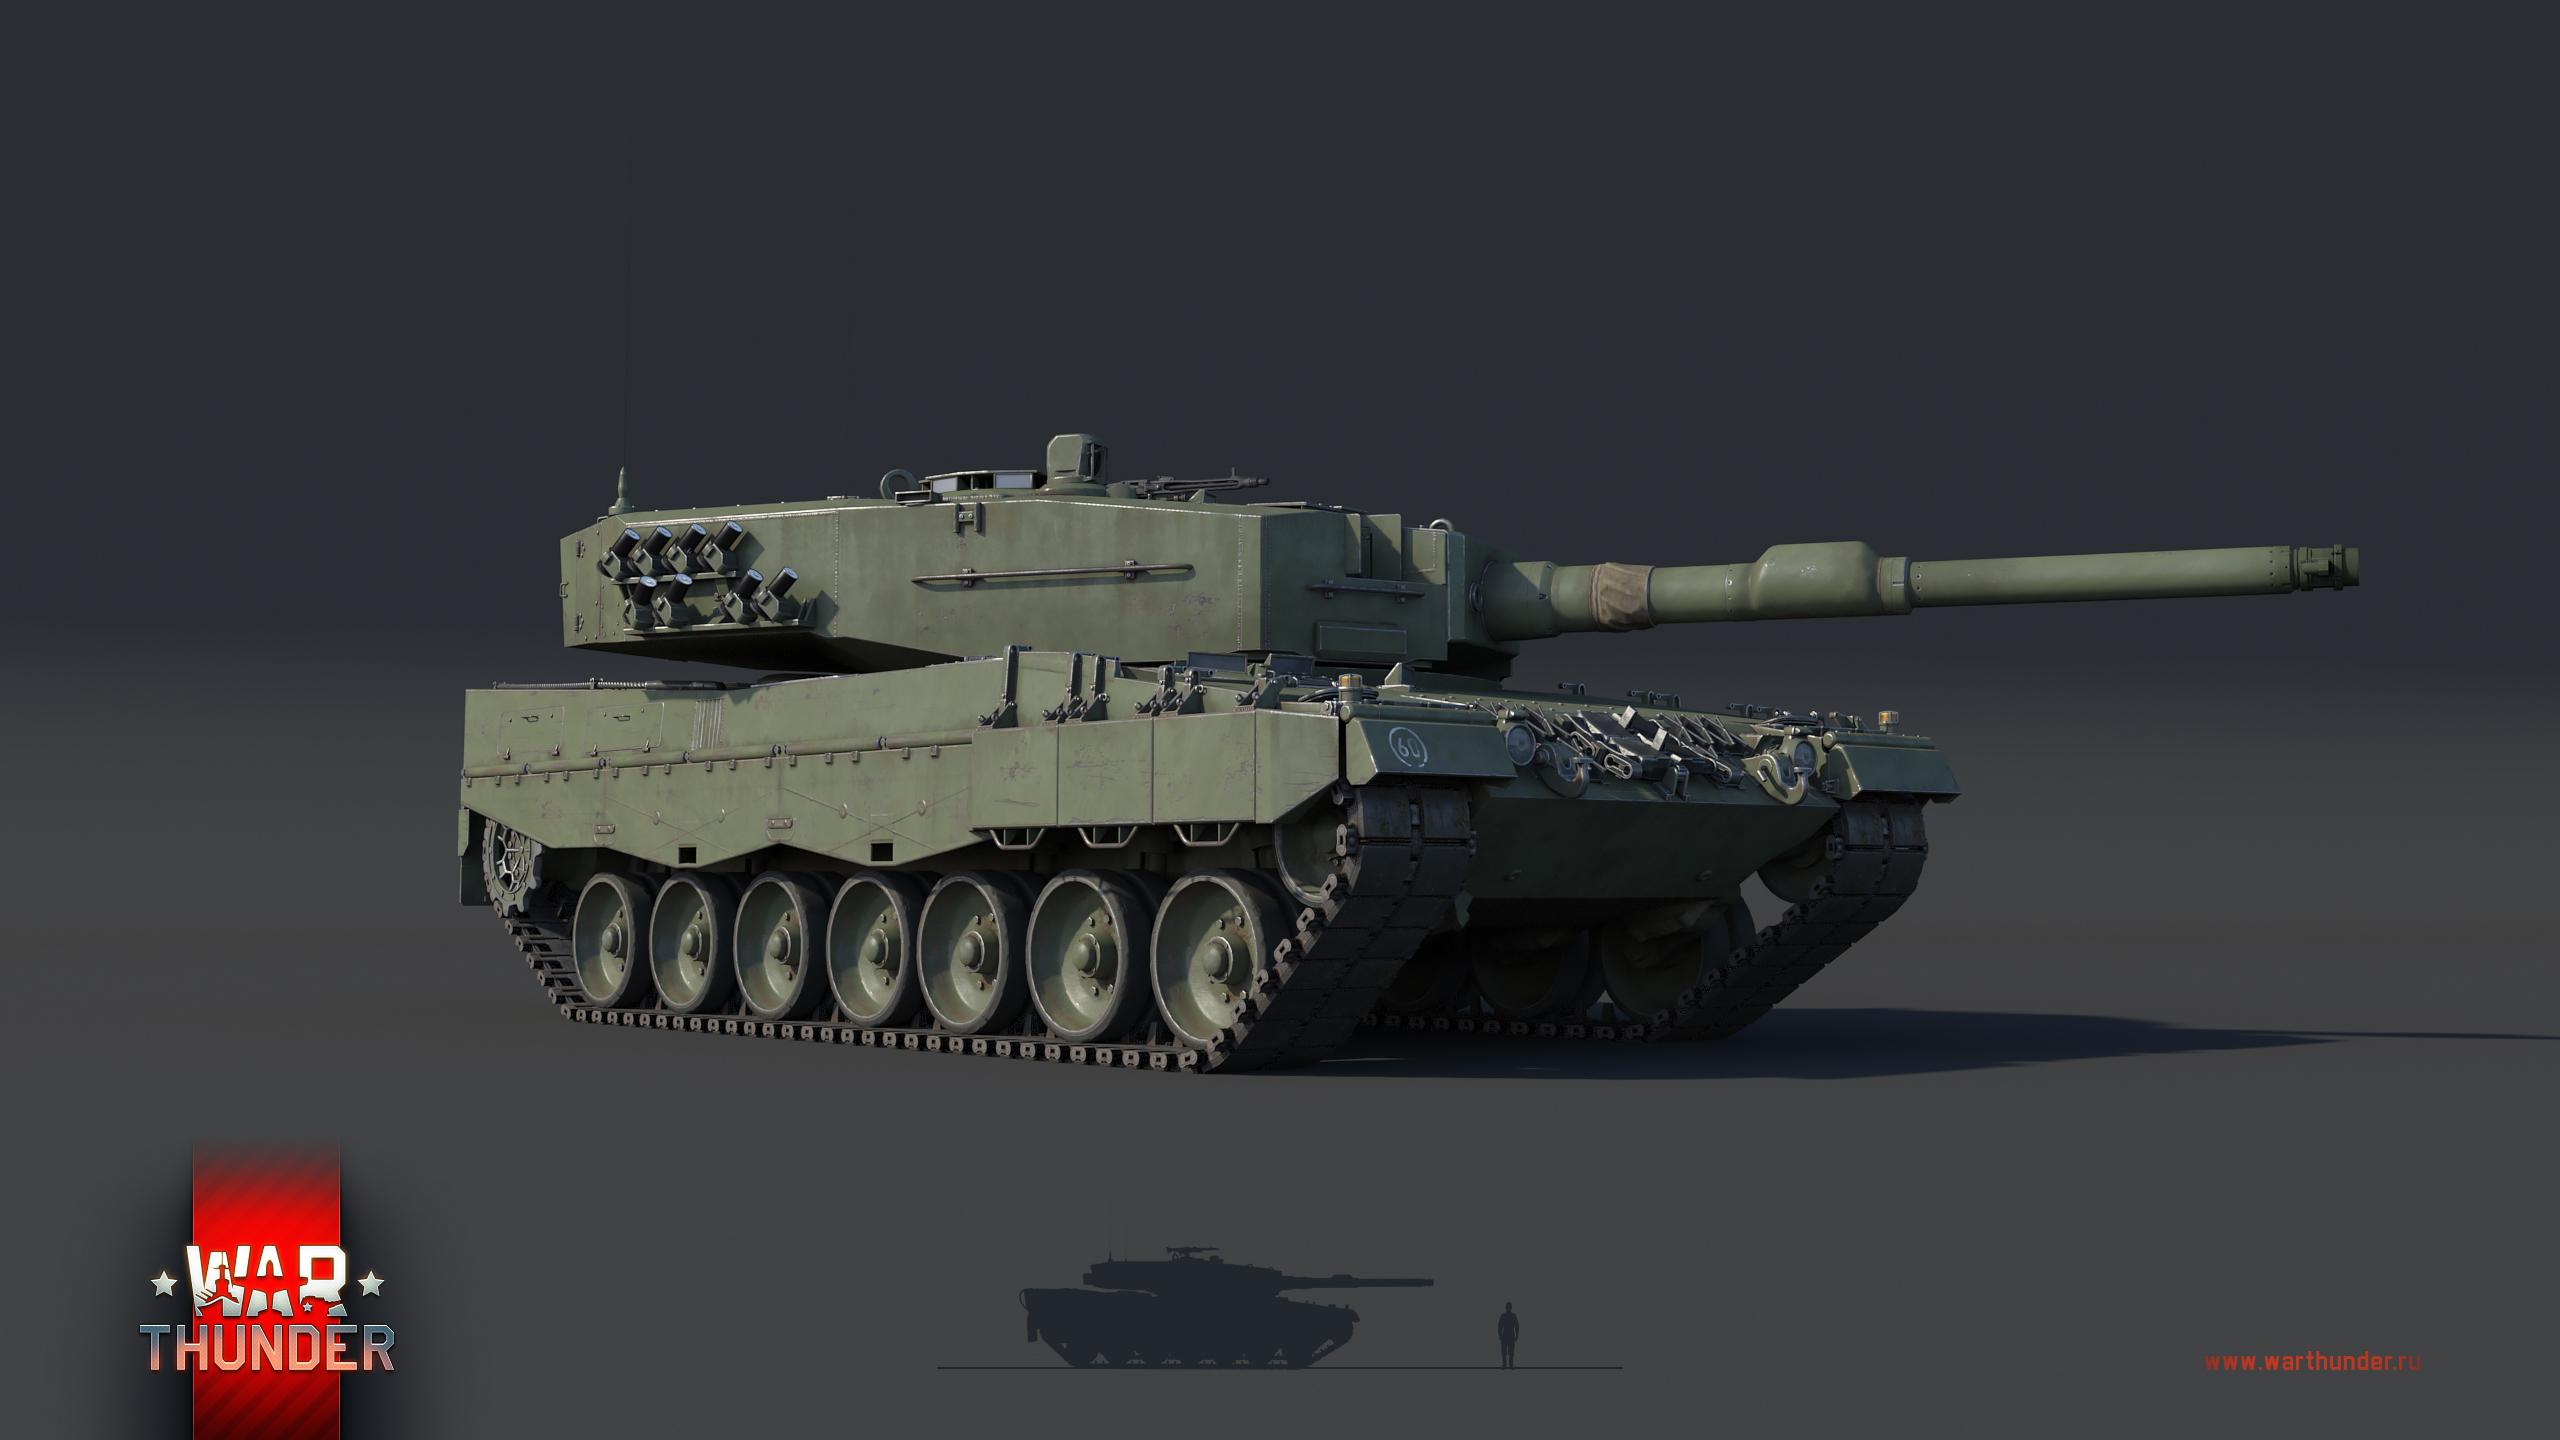 leopard_2a4_2560x1440_logo_ru_4eeb4822ce